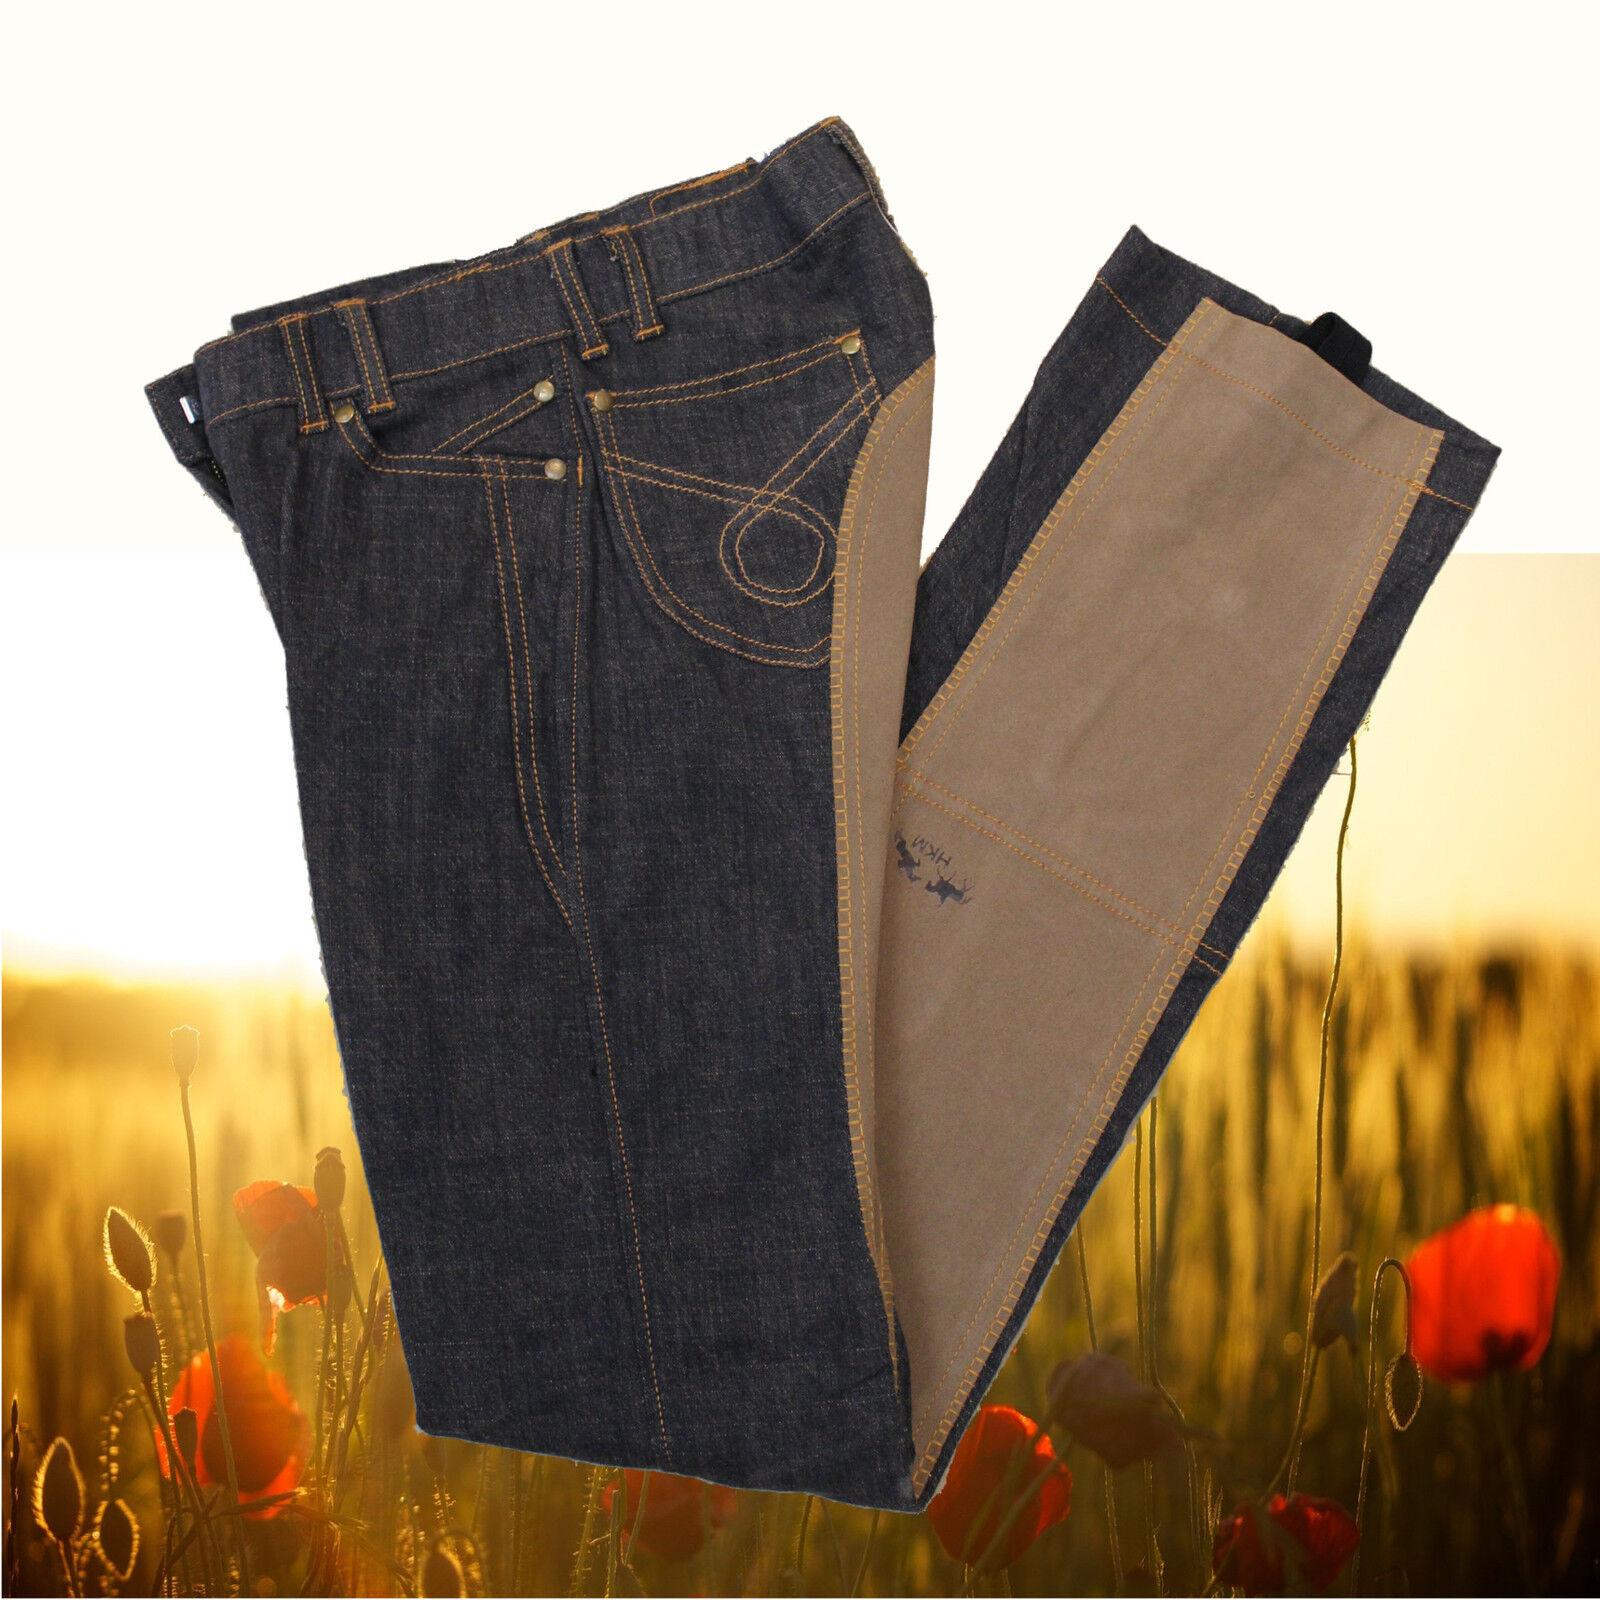 HKM Kinder Jodhpur Reithose Jeans, Jodhpurreithose, Jeans blau-braun